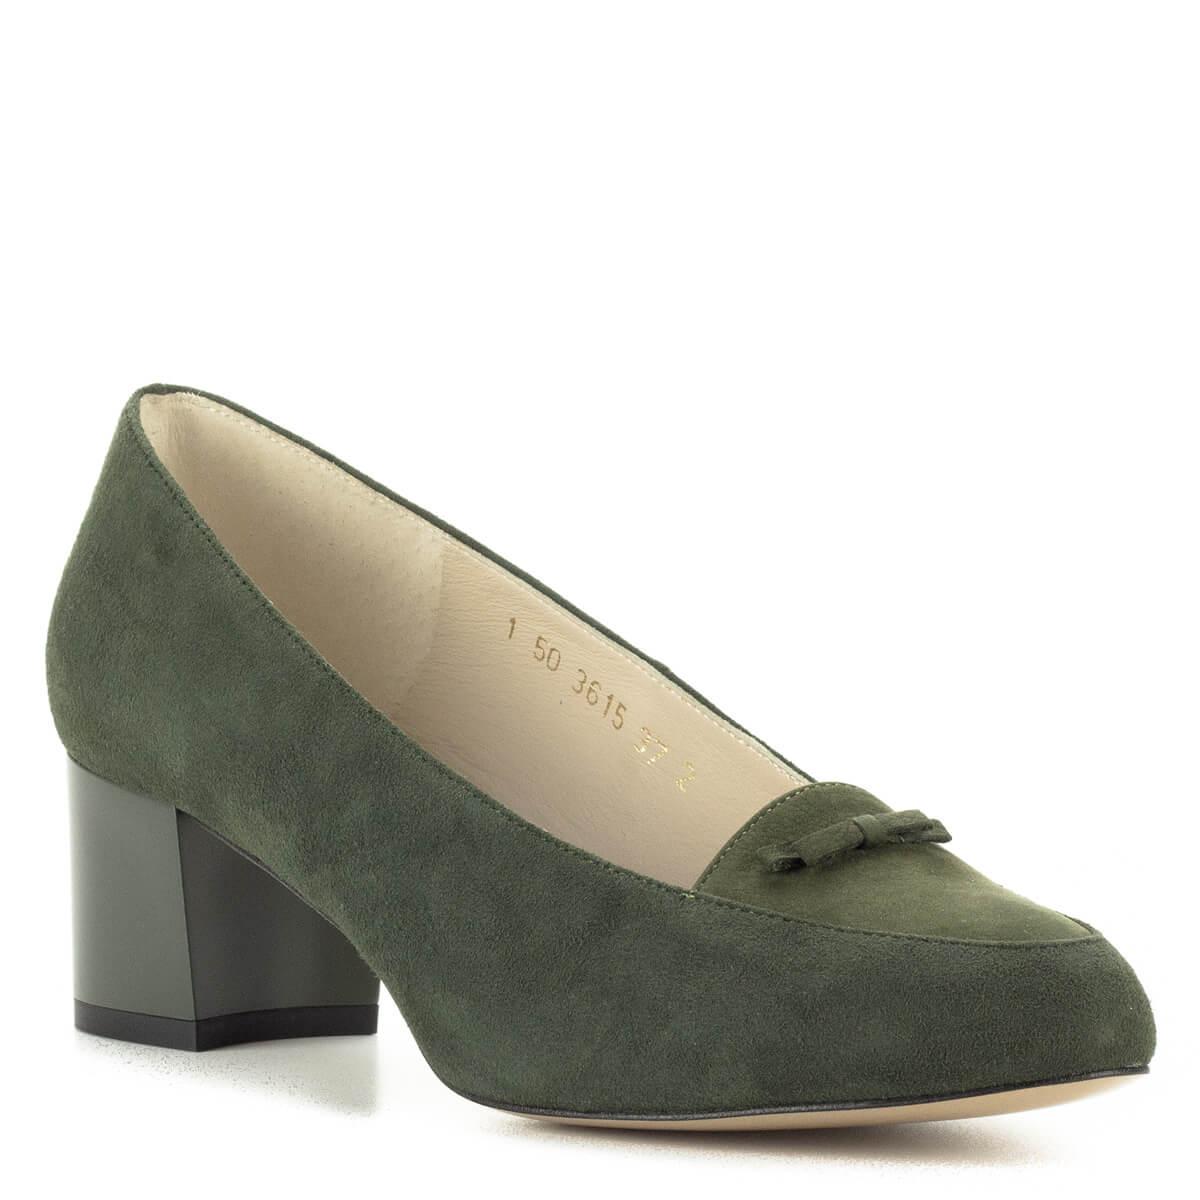 ... Anis zöld női cipő velúr bőrből 87783ce439